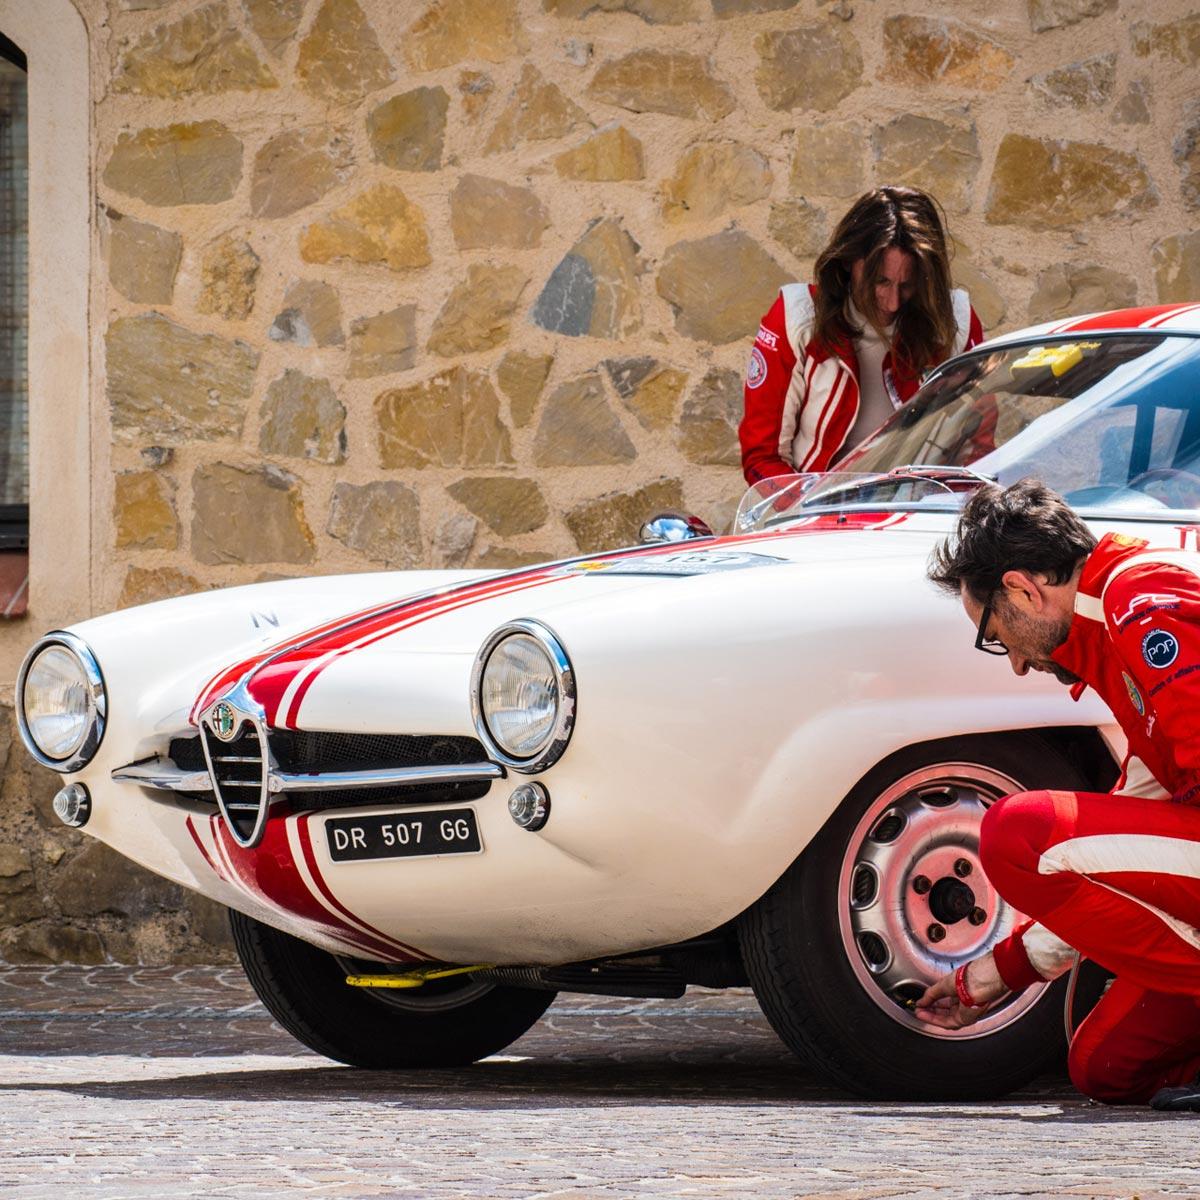 La Cote des Montres : Photo - Zenith Tour Auto Optic 2ooo - Samedi 28 avril : Aix-en-Provence – Nice